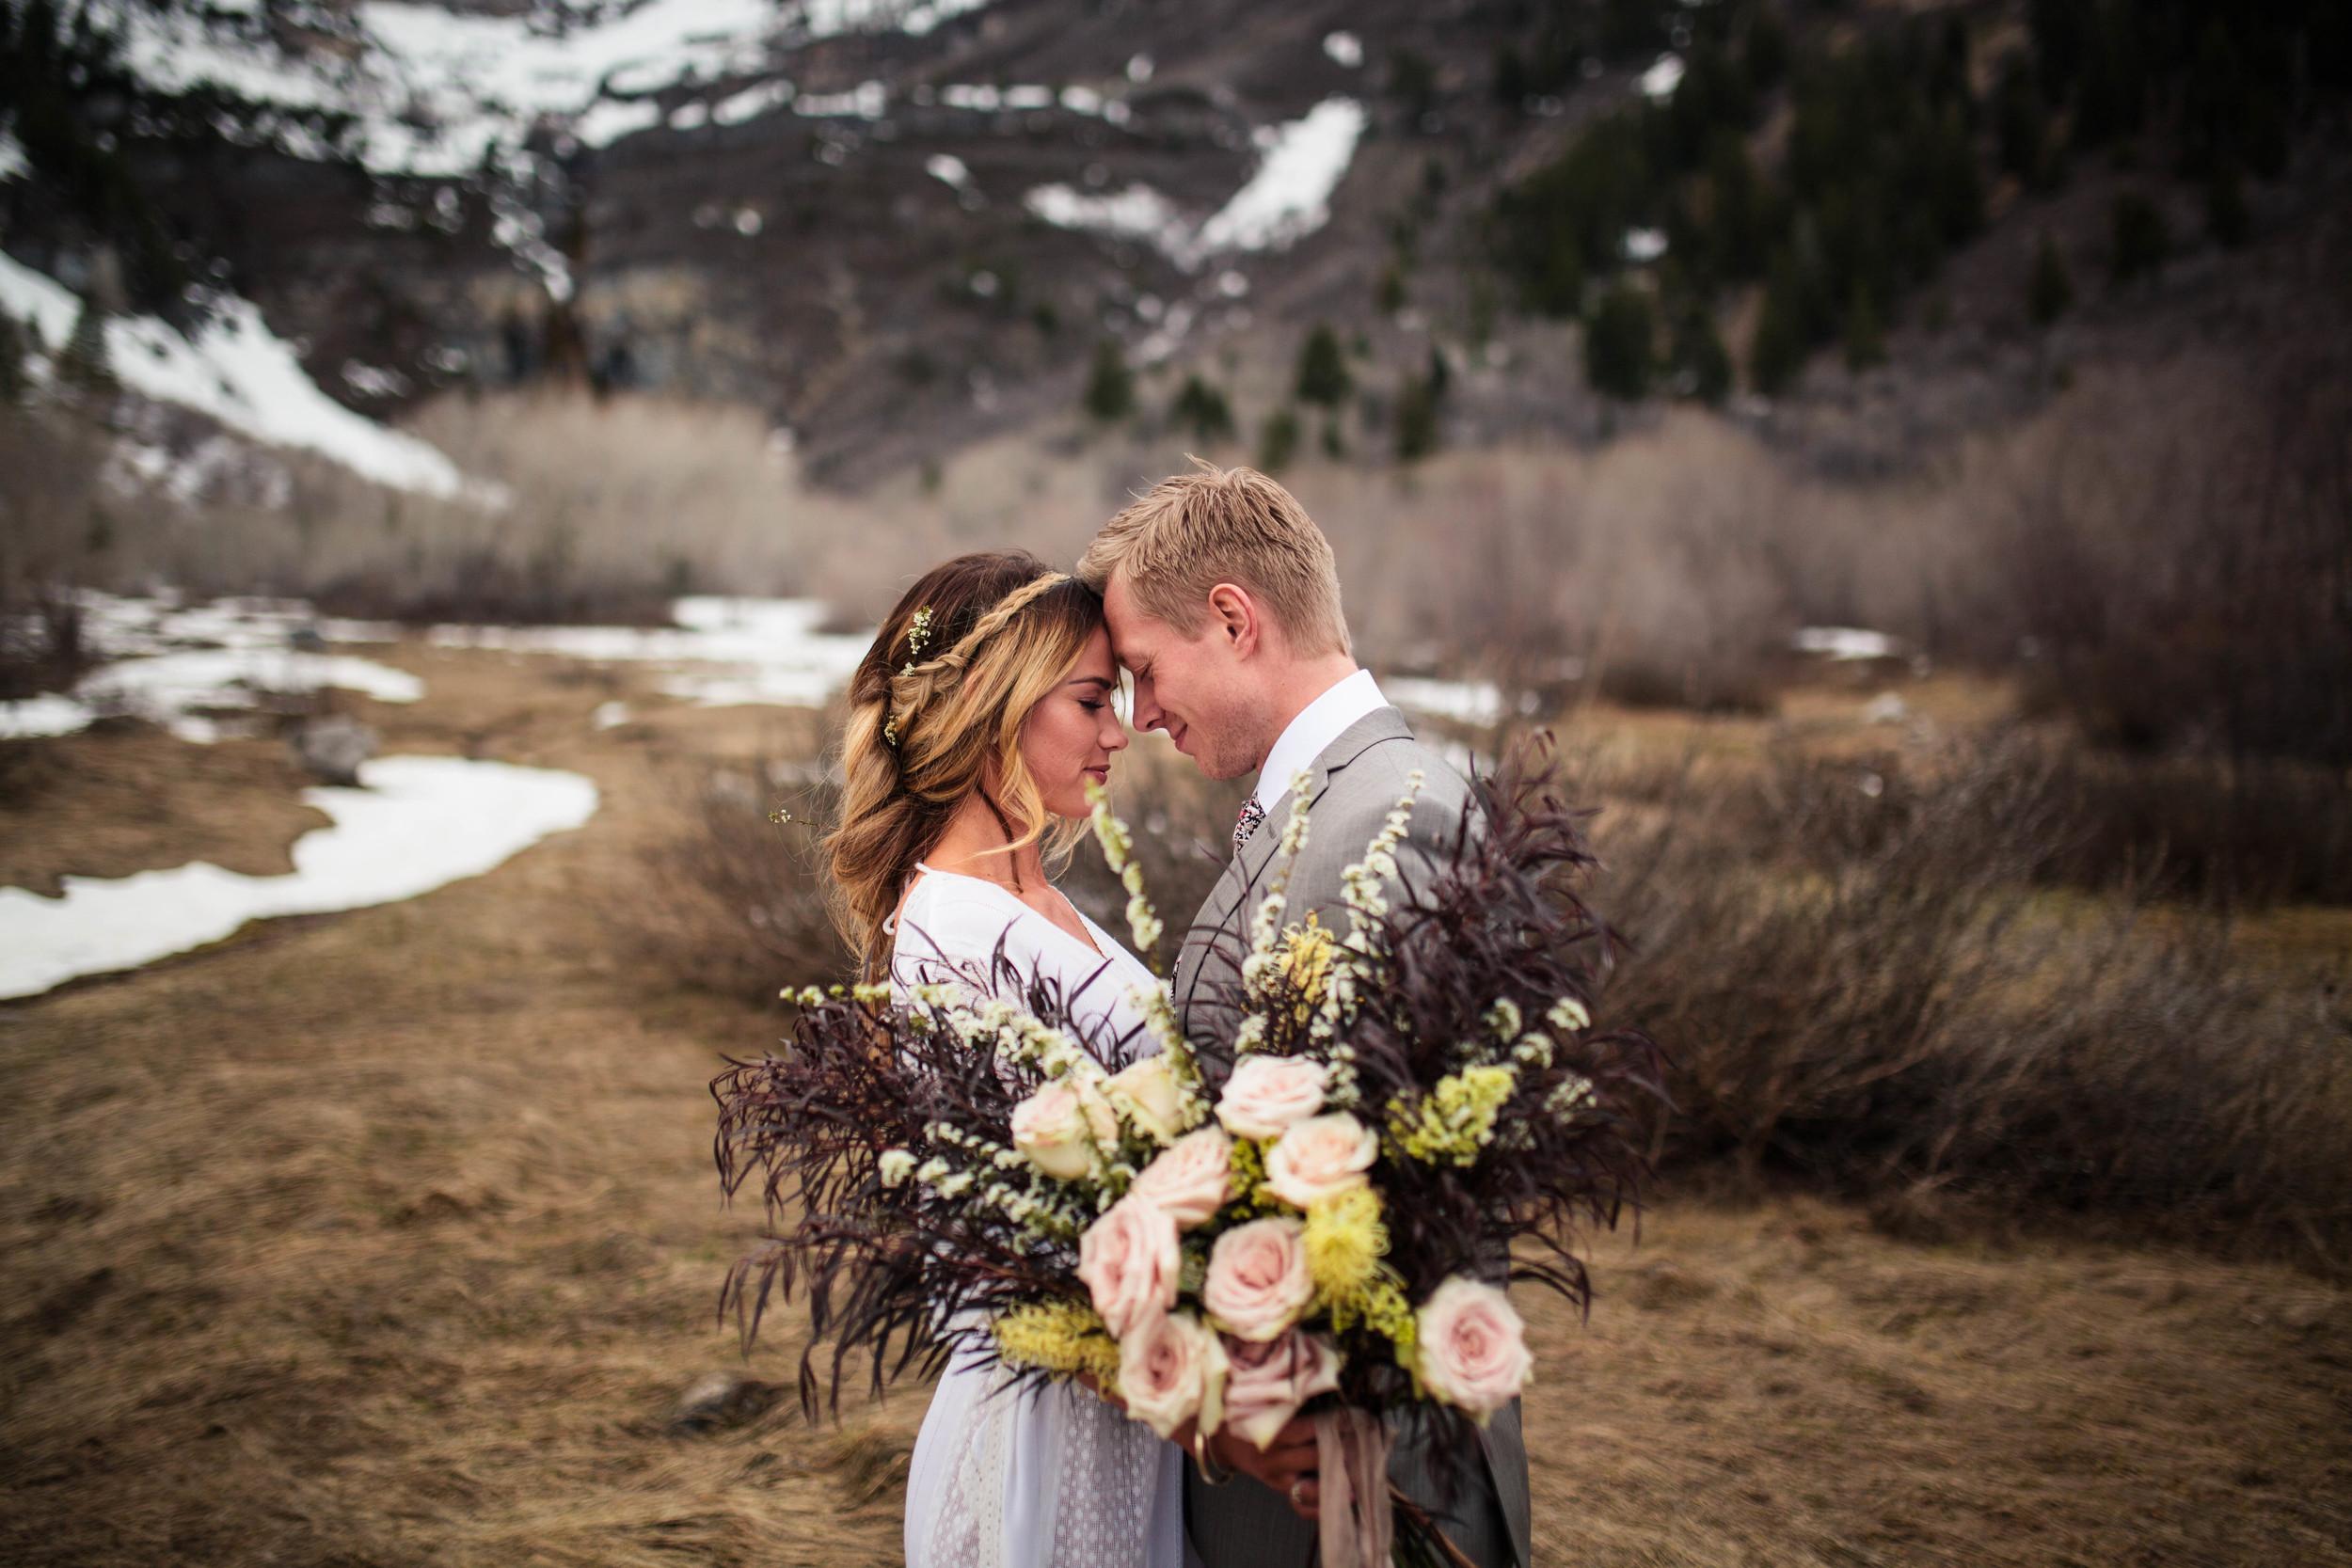 Candace & Thomas - Stylized Elopement - Whitney Justesen Photography-28.jpg